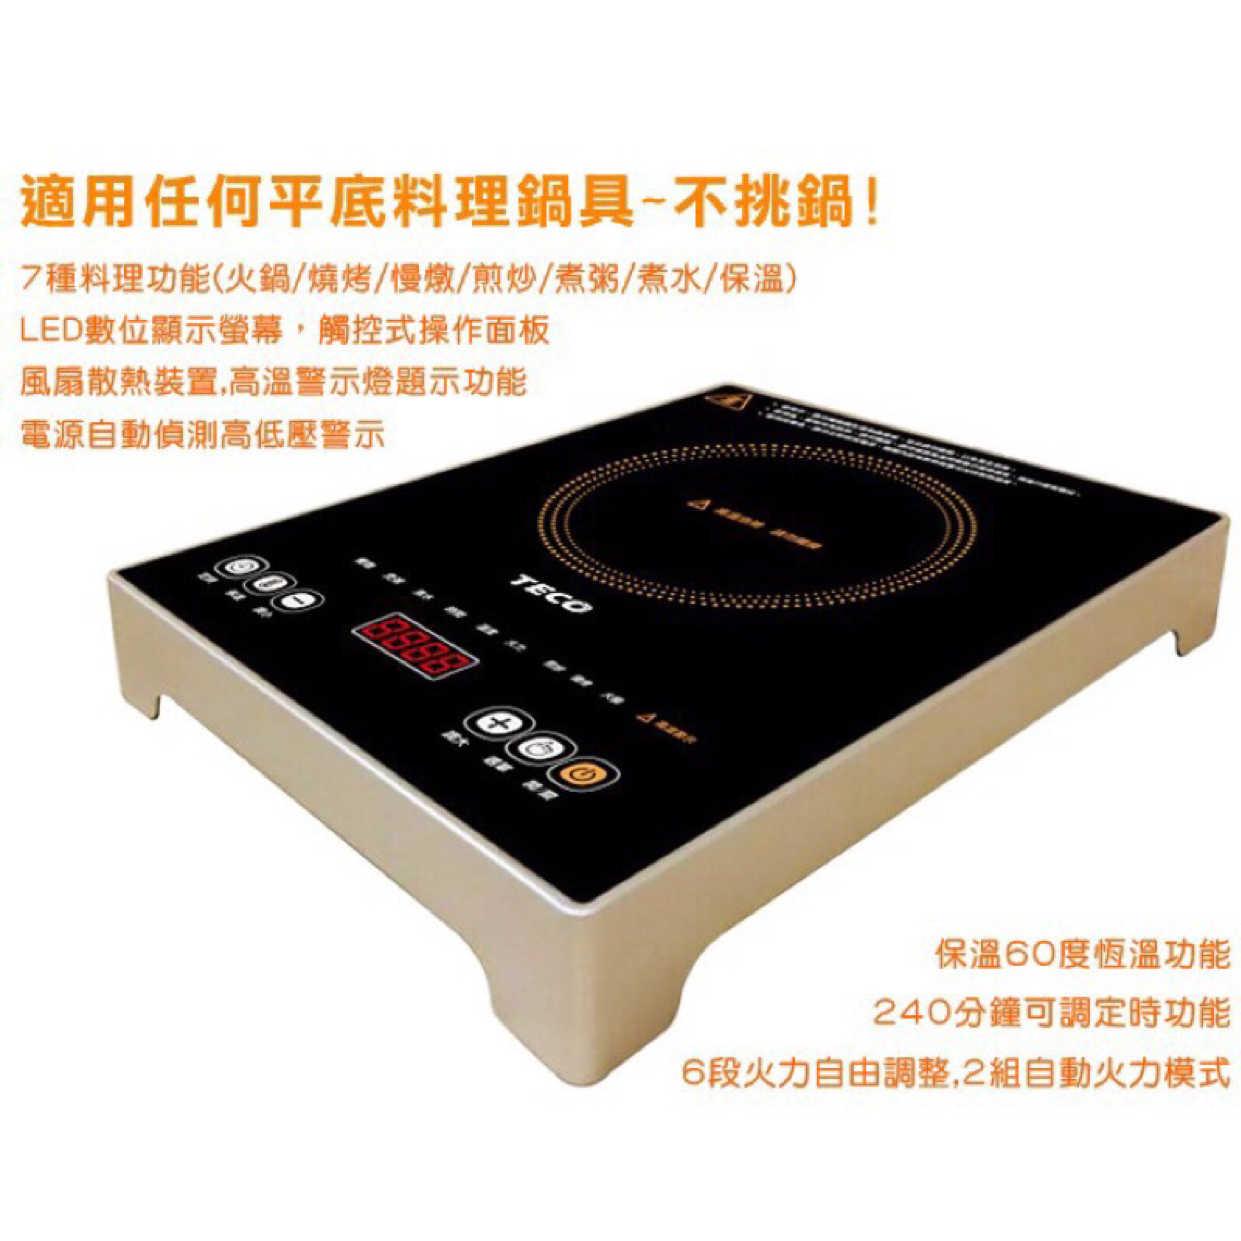 [ TECO 東元 ]微電腦觸控電陶爐 XYFYJ576